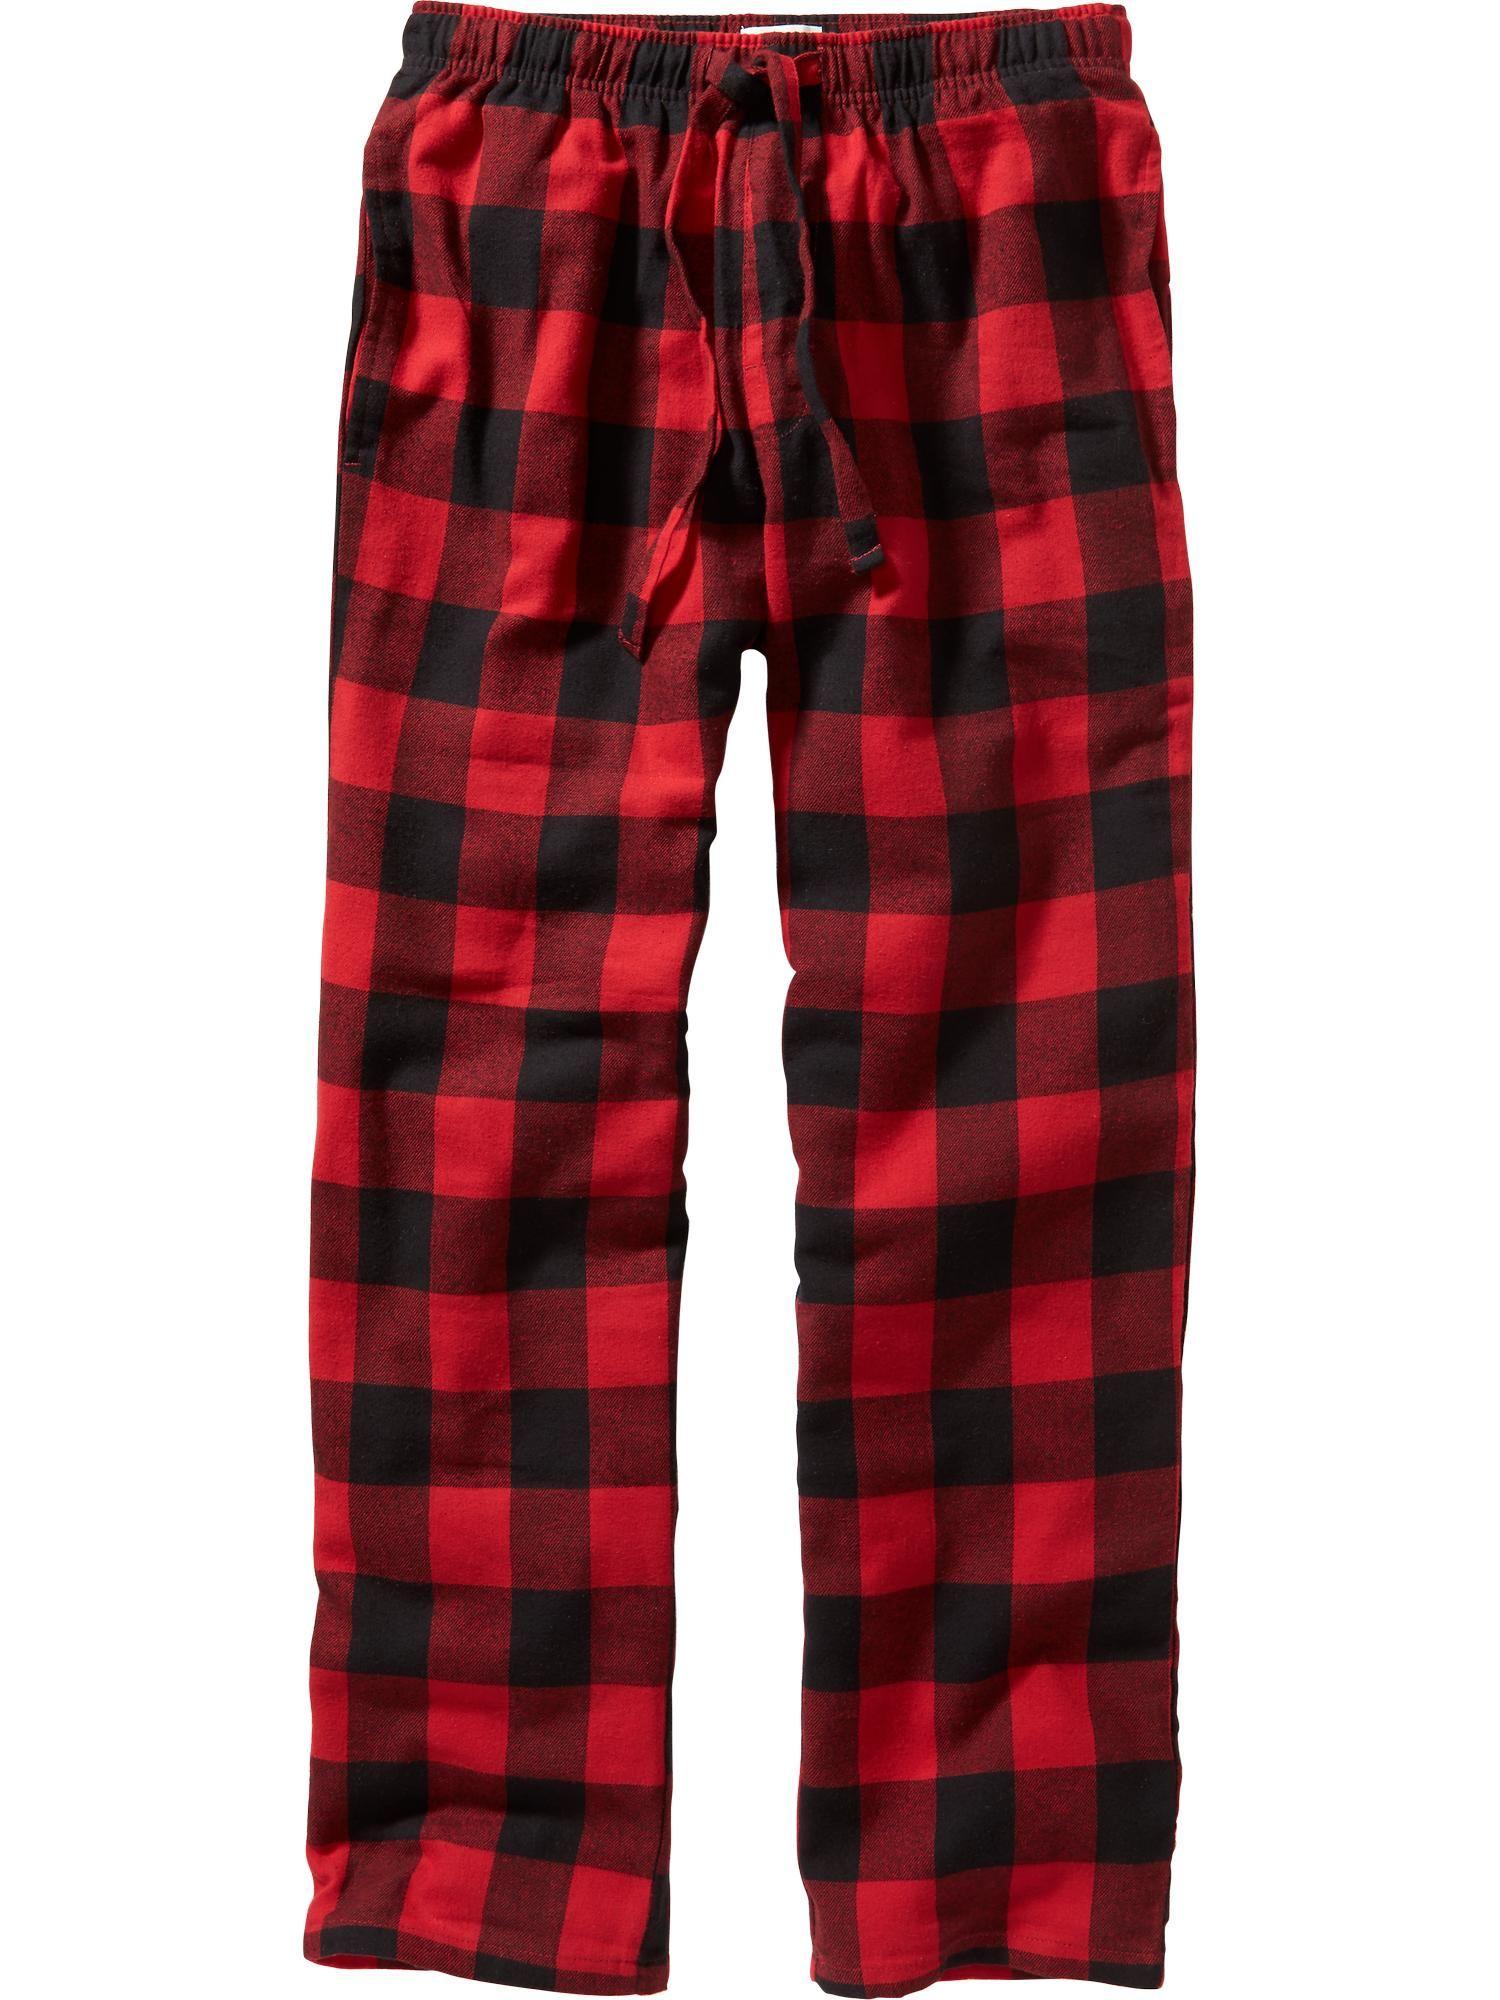 68c50125b9ca91 Men's Plaid Flannel PJ Pants   Boy's Got Style! in 2019   Pants ...